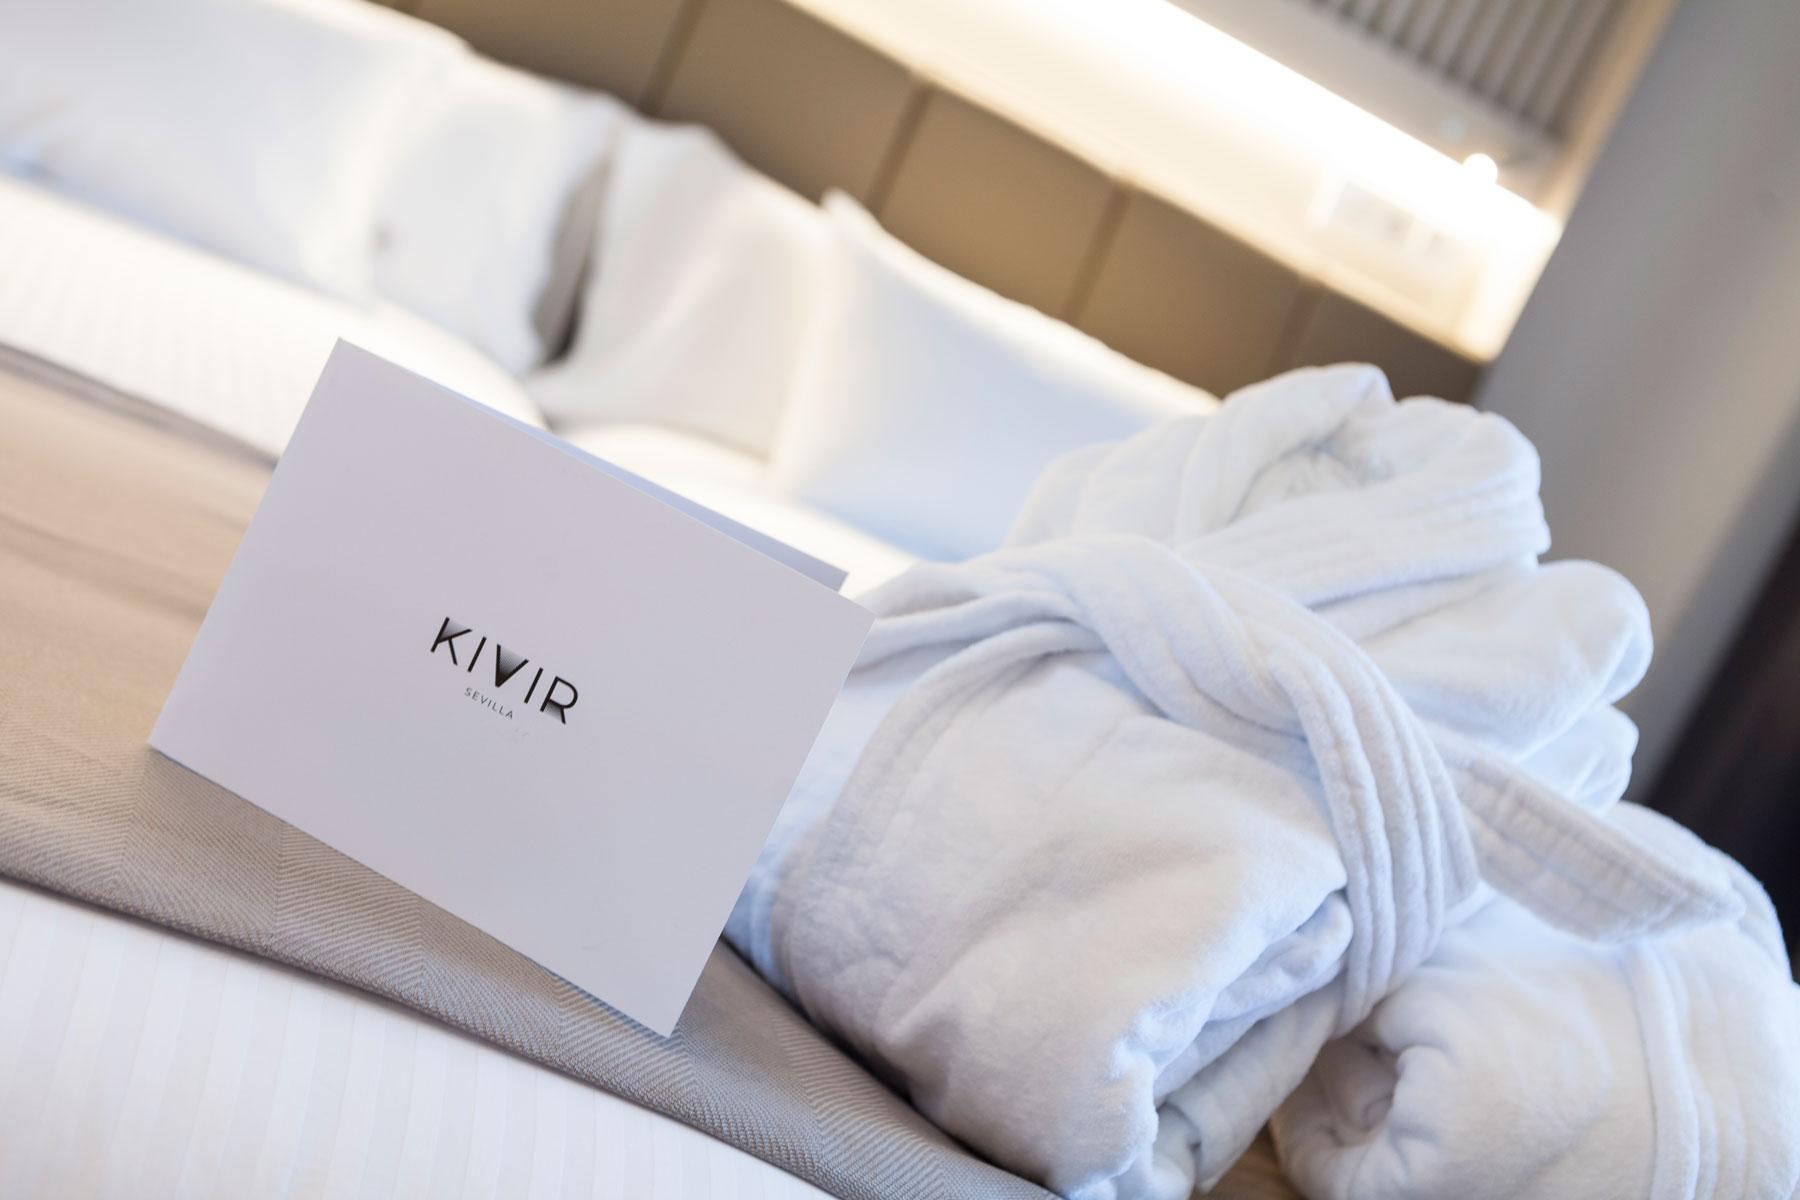 hotel kivir habitacion detalle